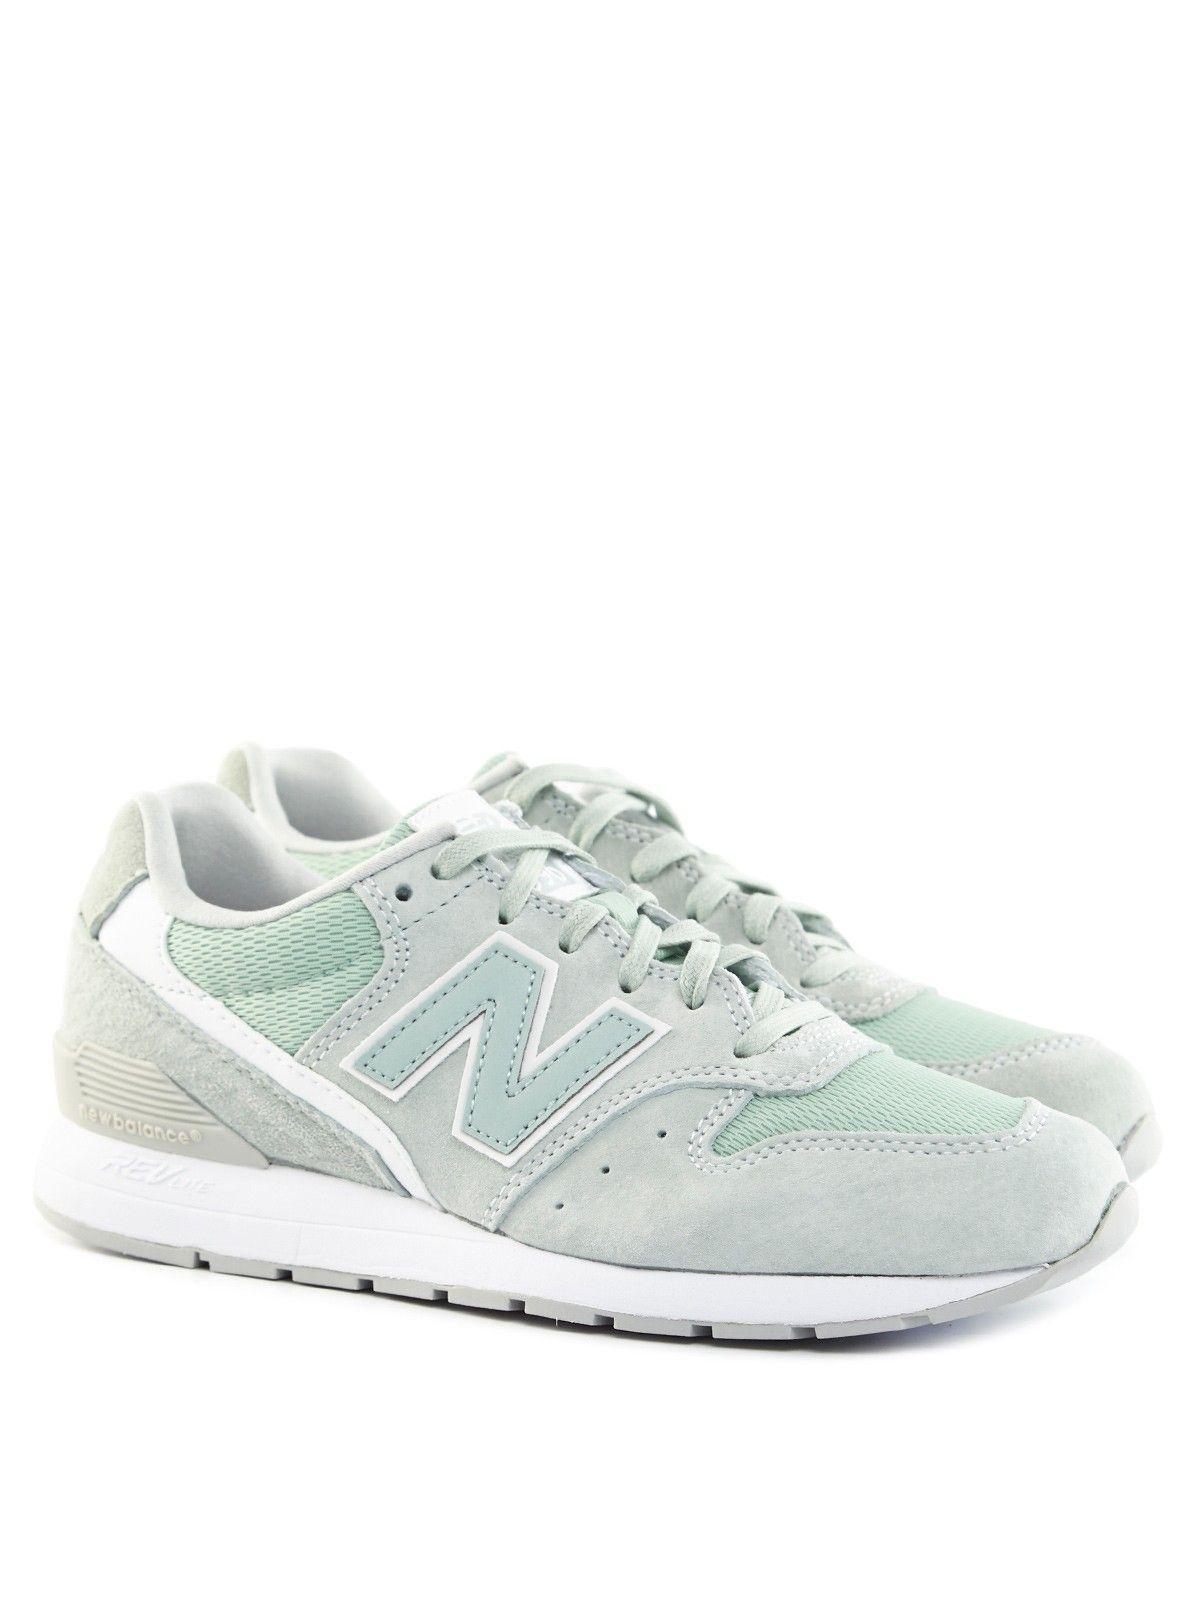 NEW BALANCE MRL996LH Damen Sneaker Grün online kaufen ...